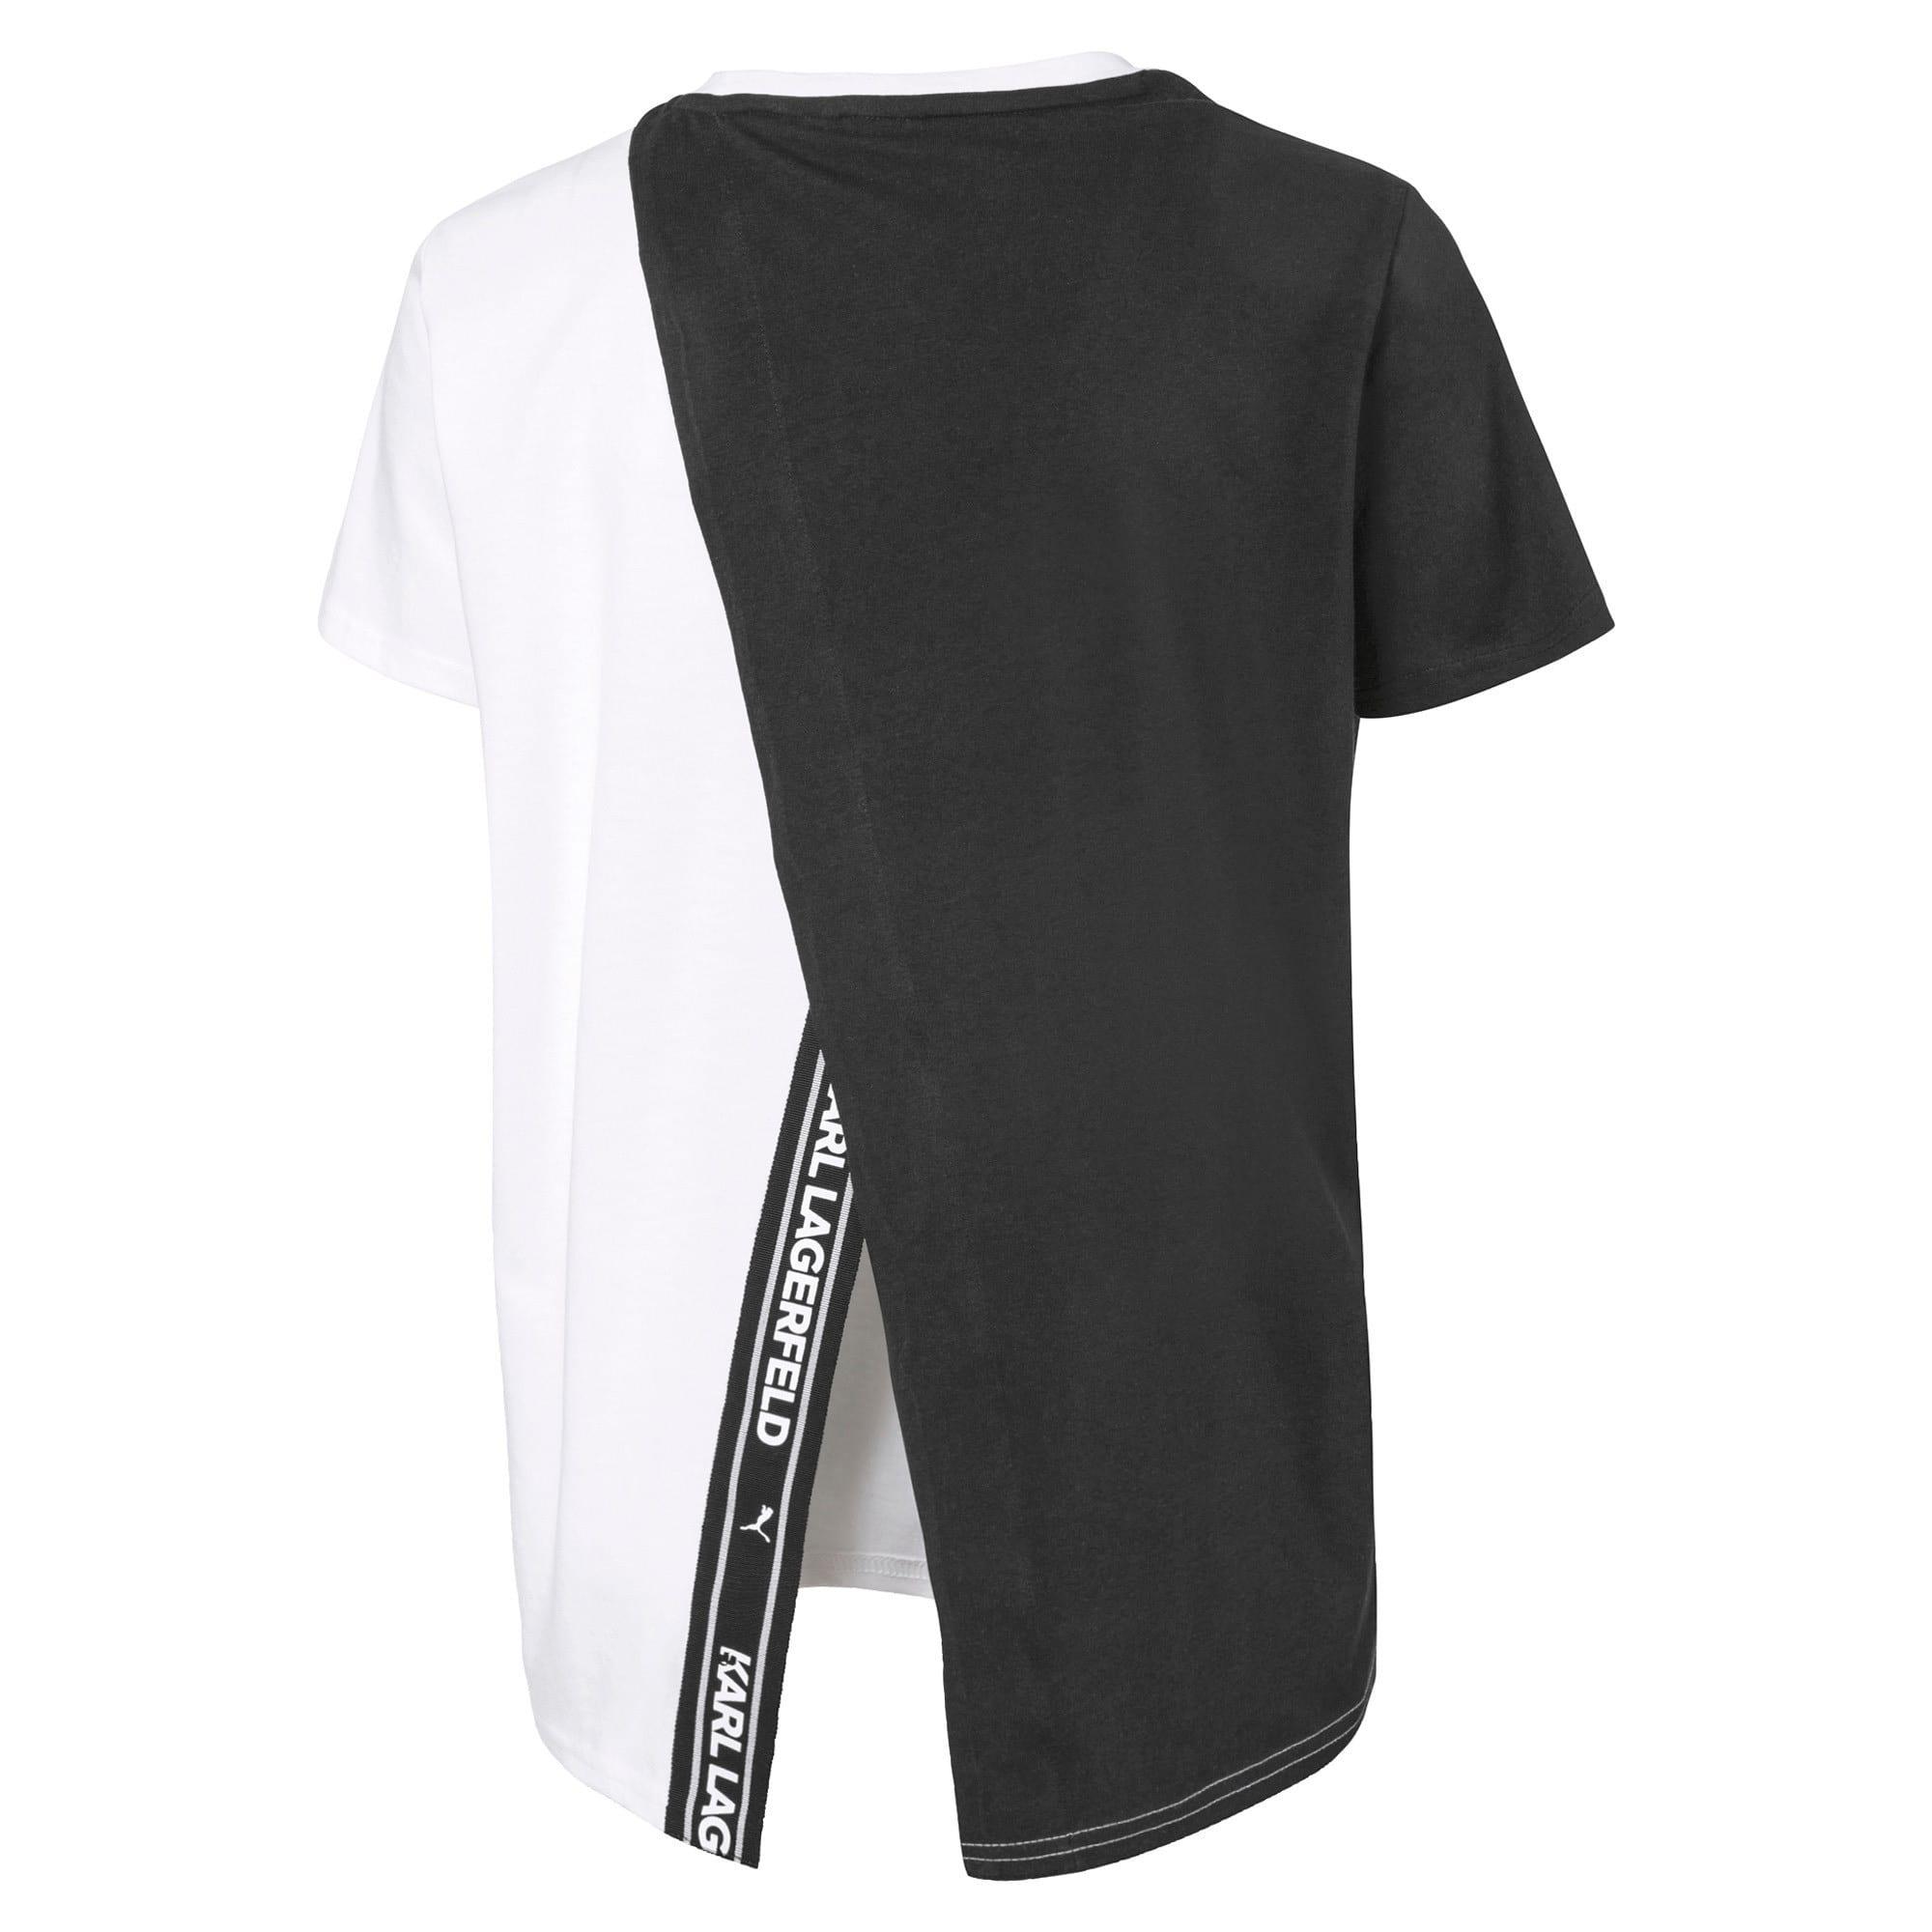 Miniatura 2 de Camiseta de espalda abierta PUMA x KARL LAGERFELD para mujer, Puma Black, mediano